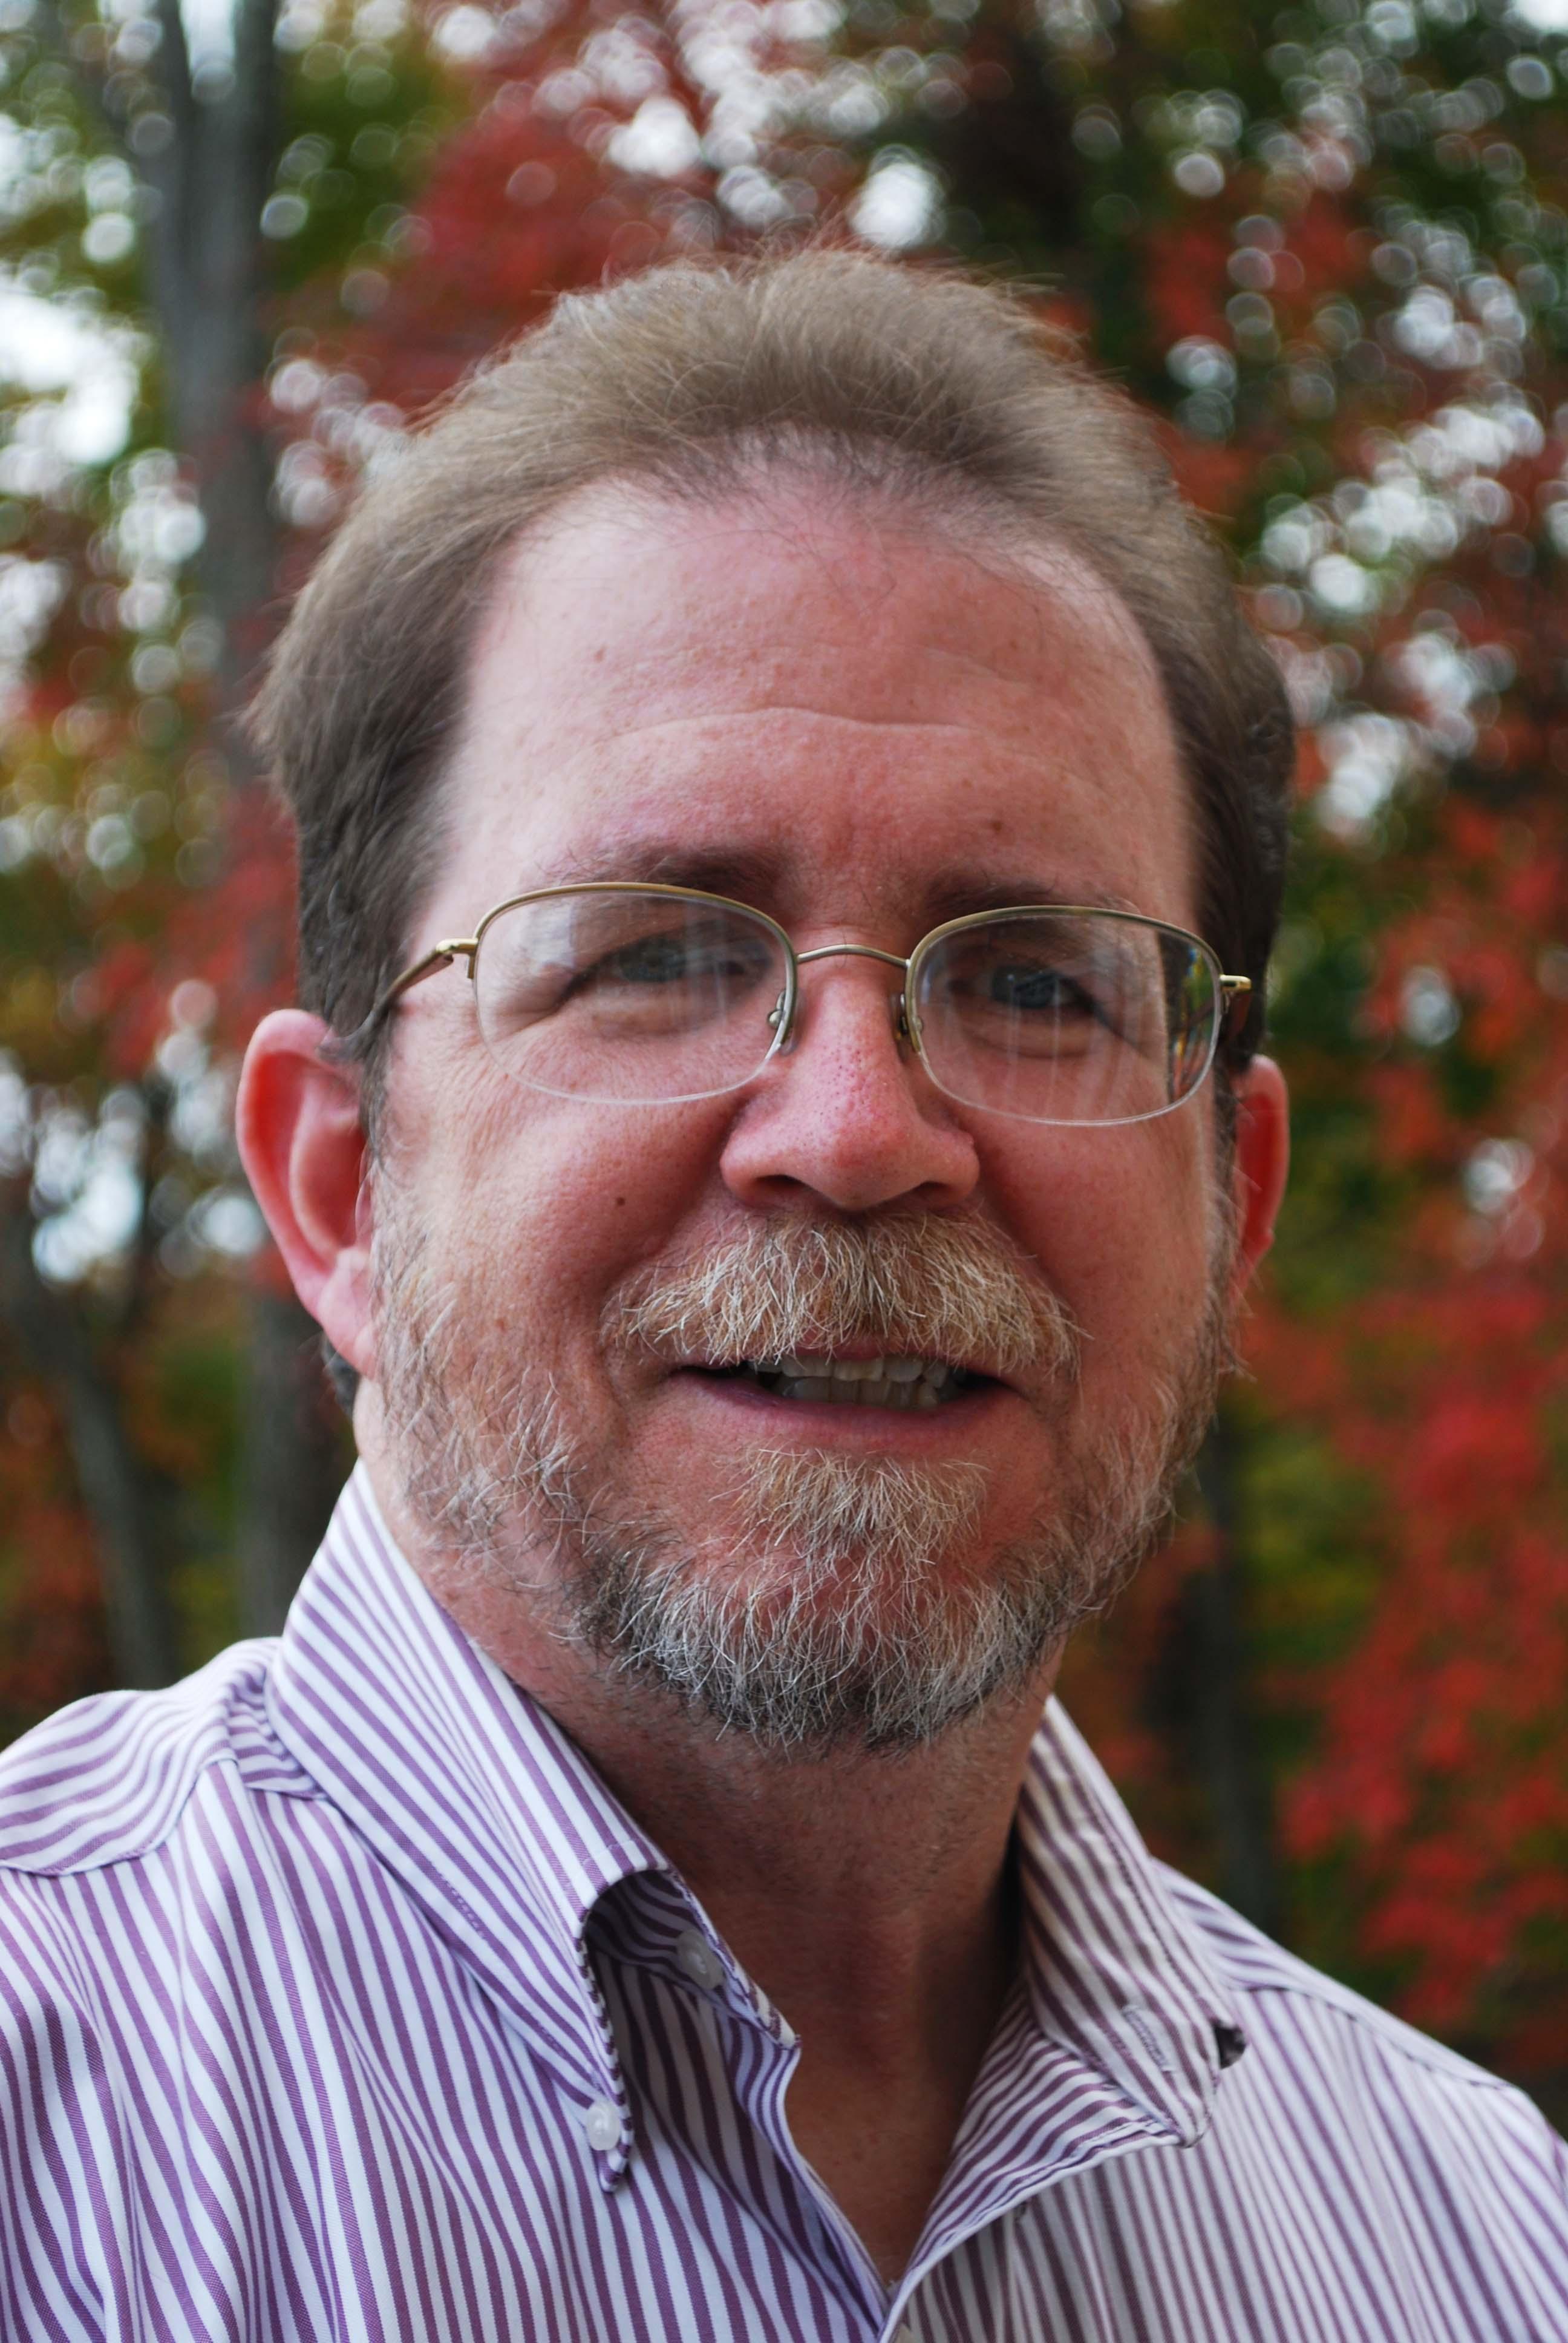 Jack Mulcahy Resume Services, LLC